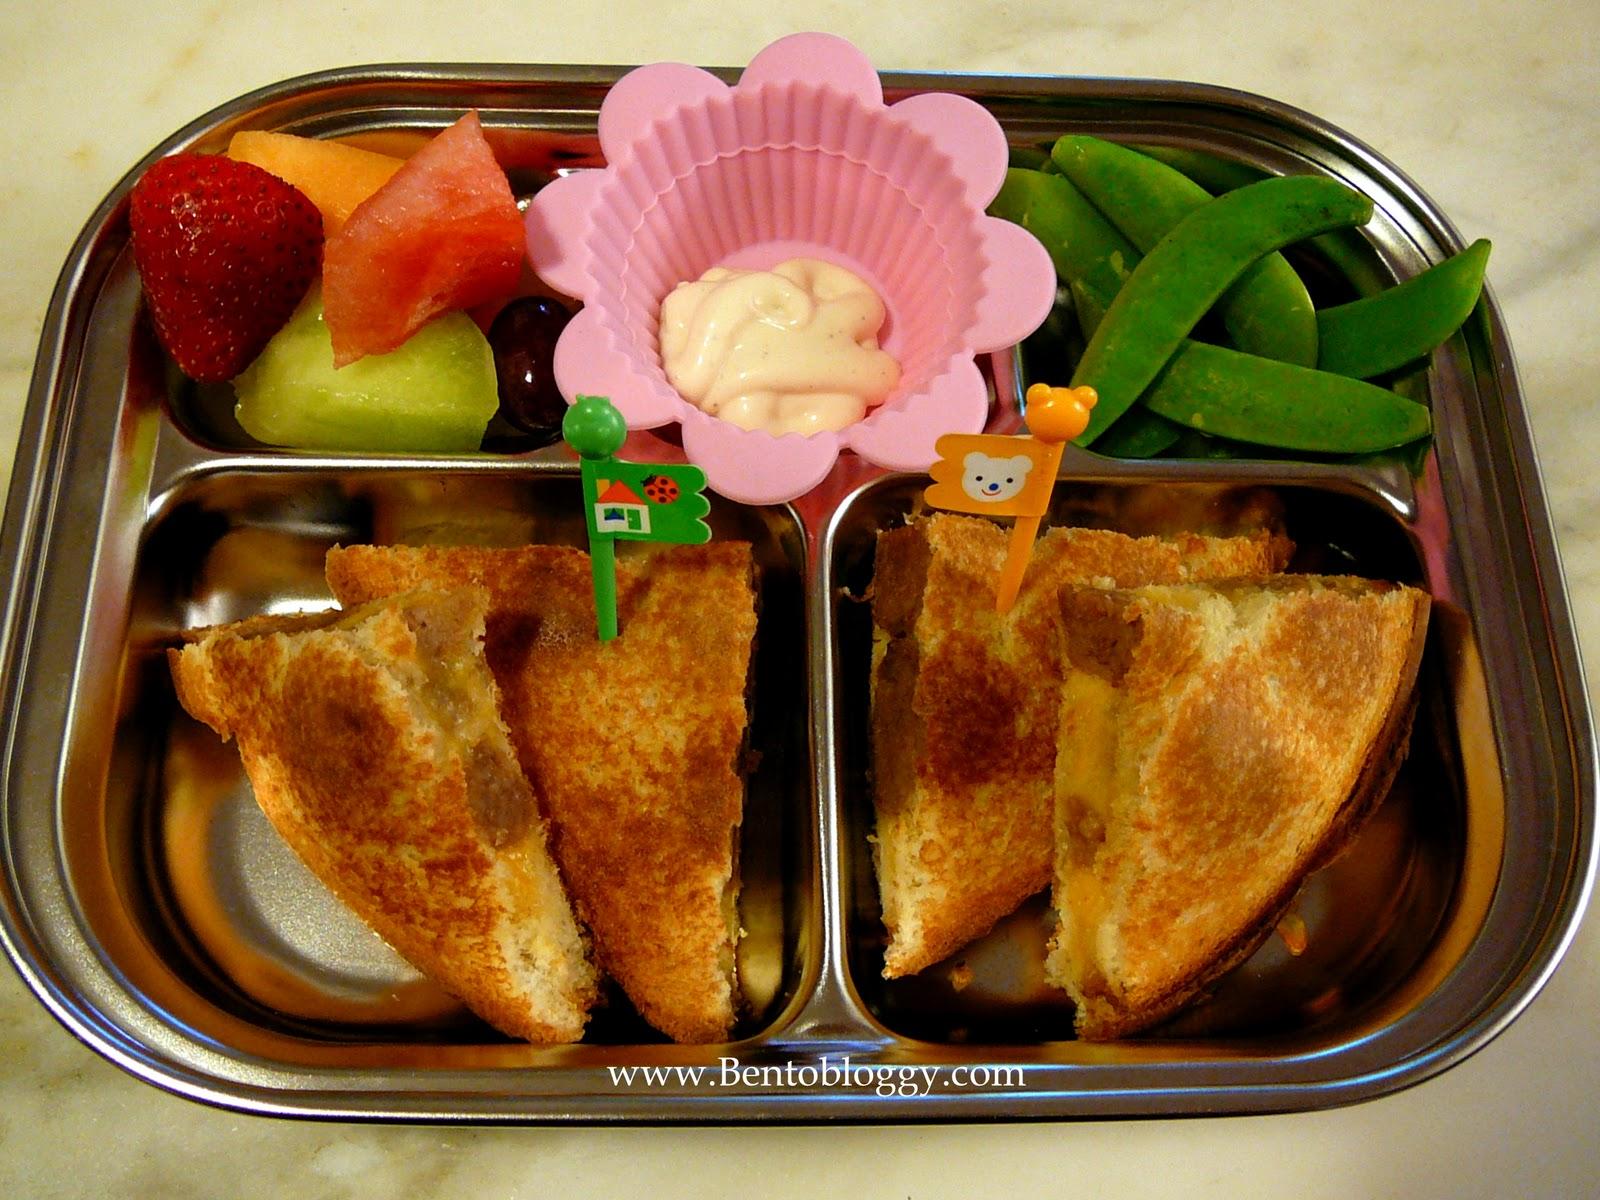 Bentobloggy: Bento #118 - Grilled Meatball Sandwich